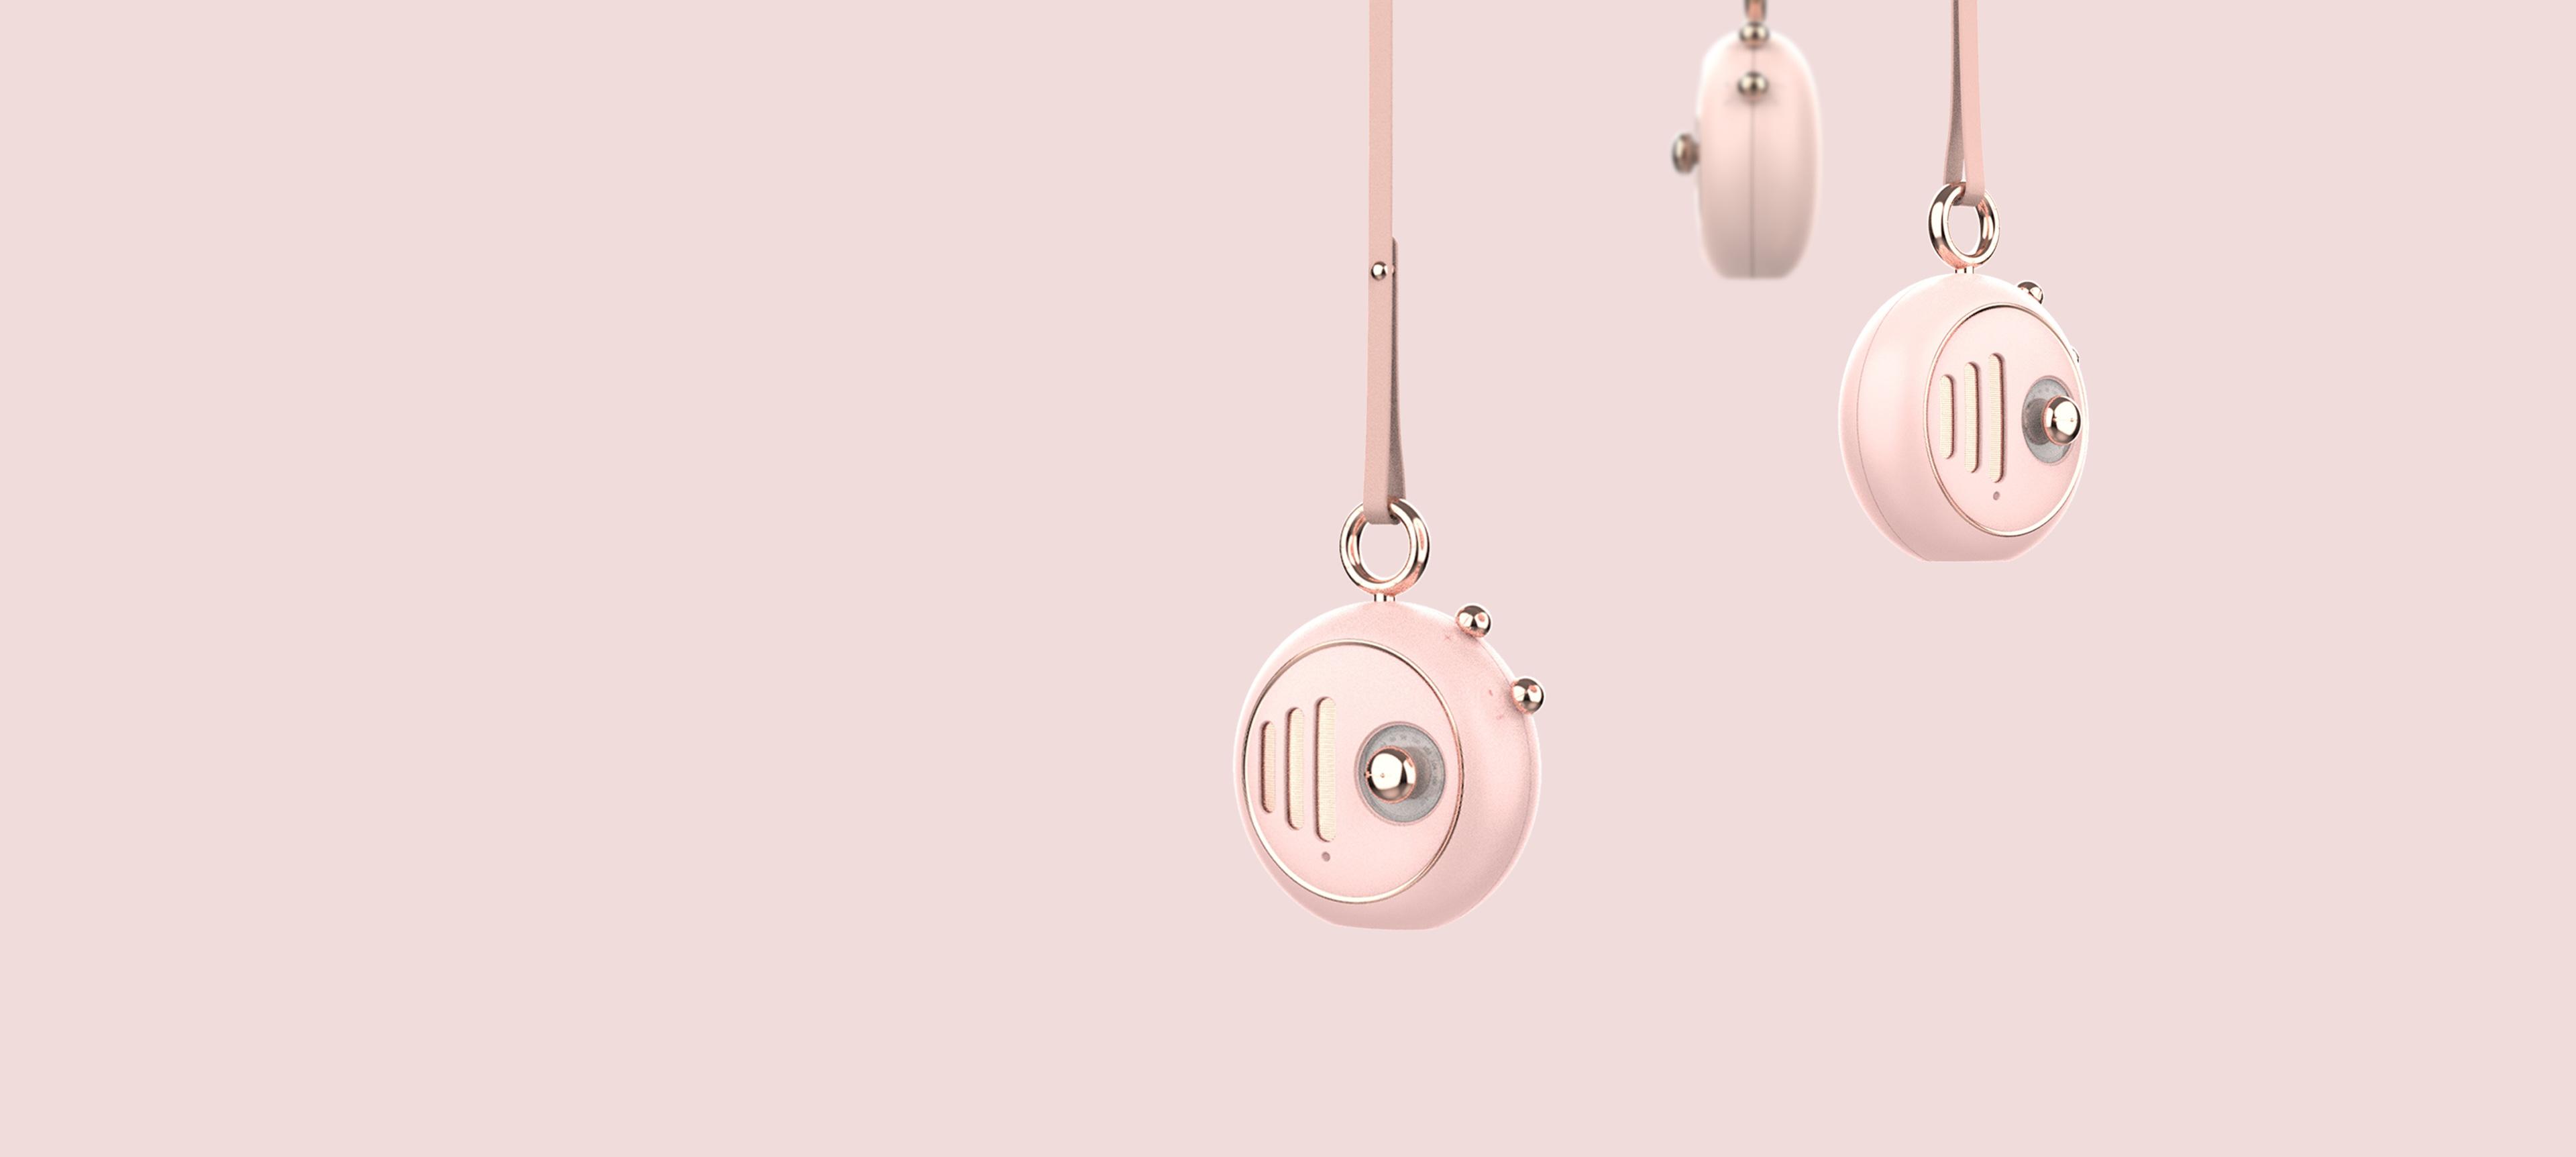 Bluetooth Speaker_心品工业设计